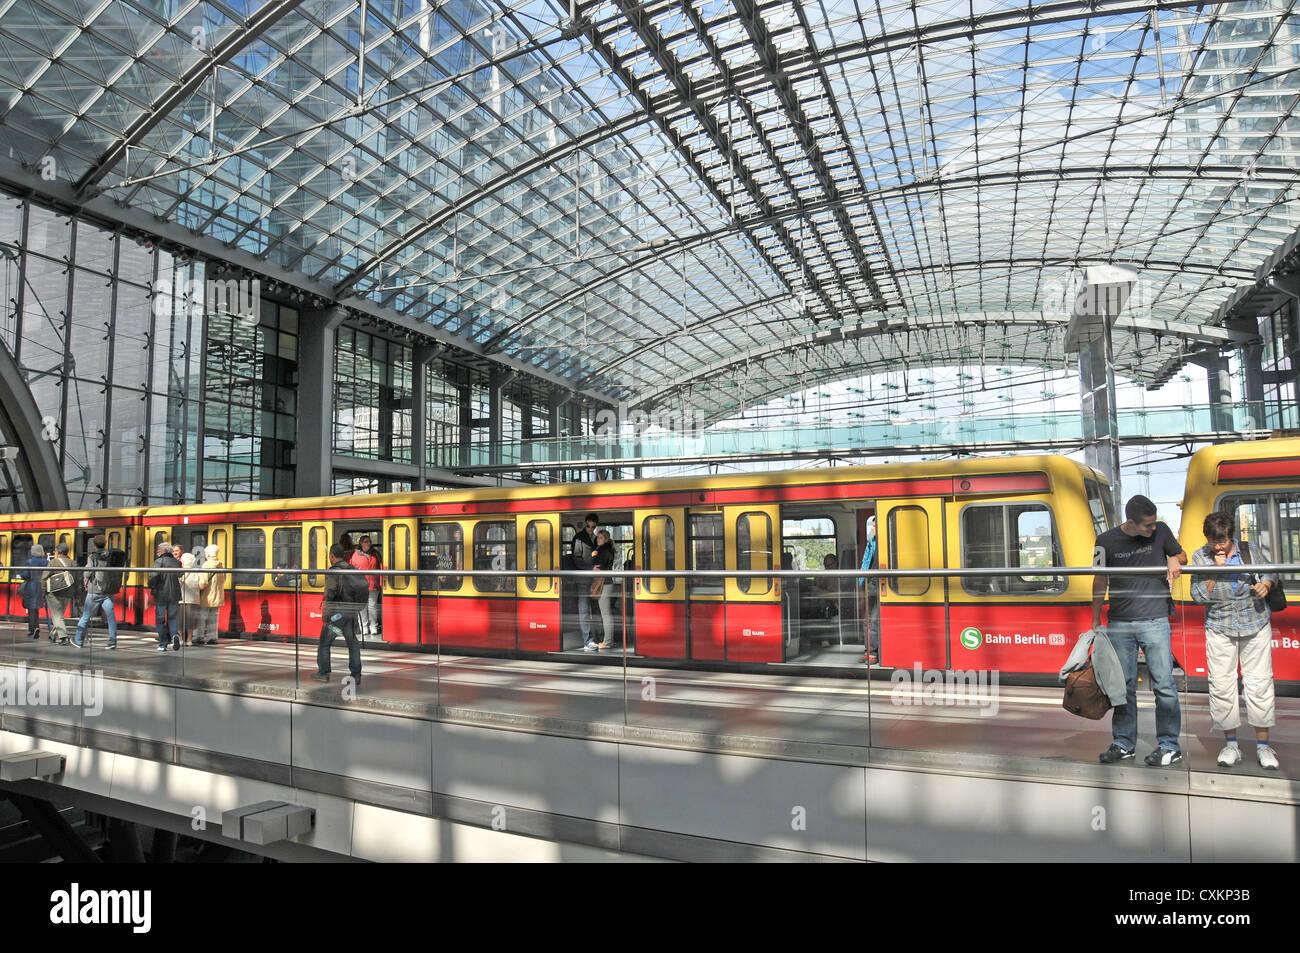 Bahn Berlin Zug in Hauptbanhof Berlin Deutschland Stockbild